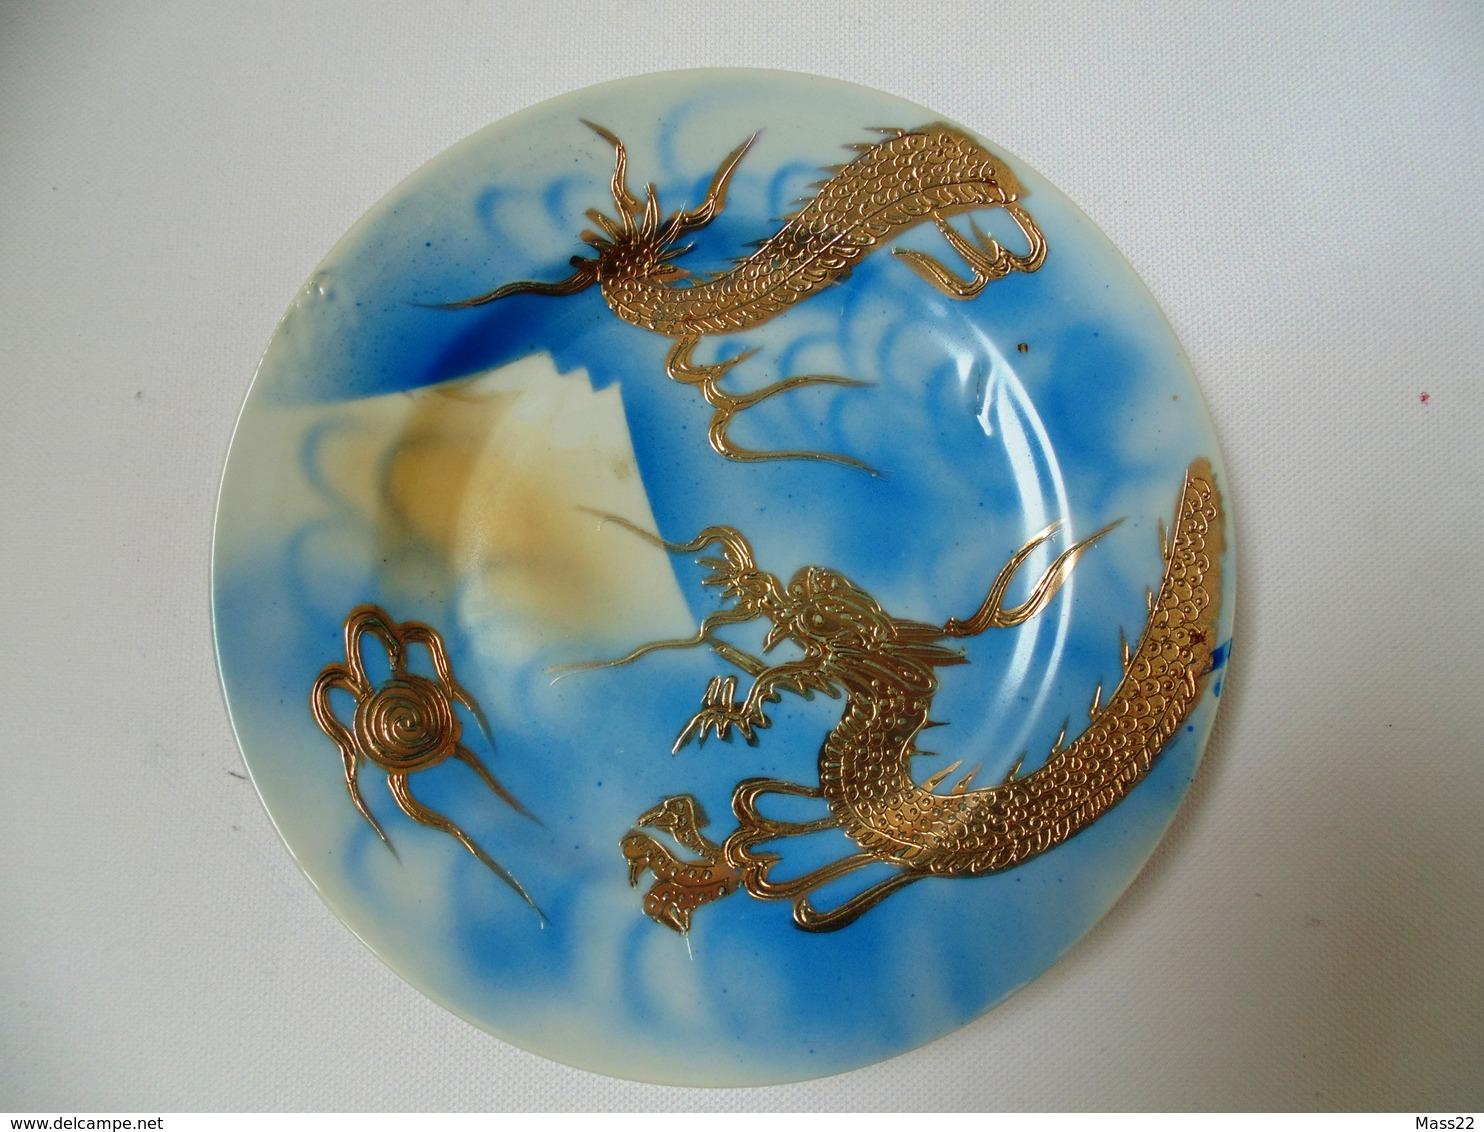 Interesting Japan Porcelain Plate With Gold Dragon And Signature - Matsukawa, Dai Nippon, Meiji (1868-1912) - Otros